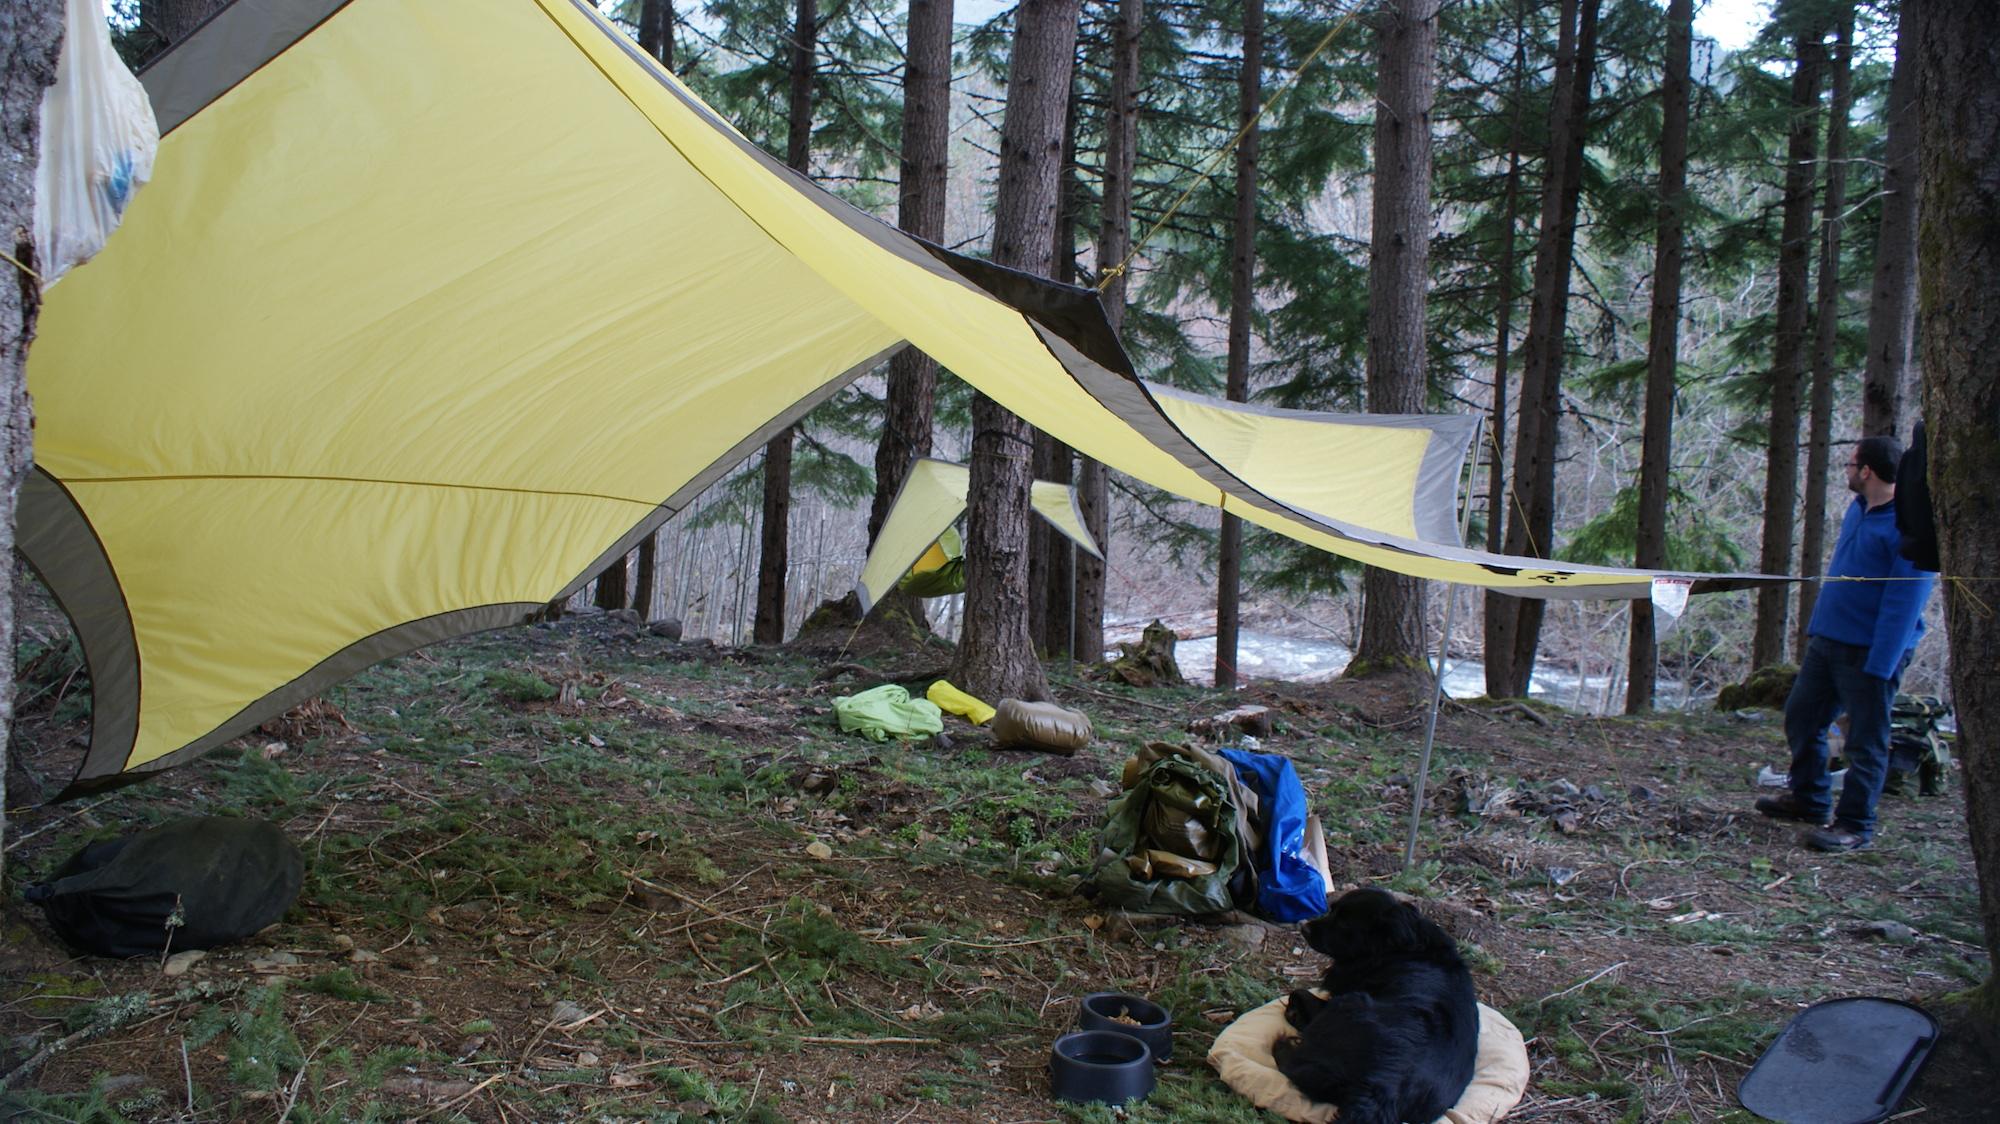 & Tent? No Thanks. I Prefer Tarps. - The Summit Register